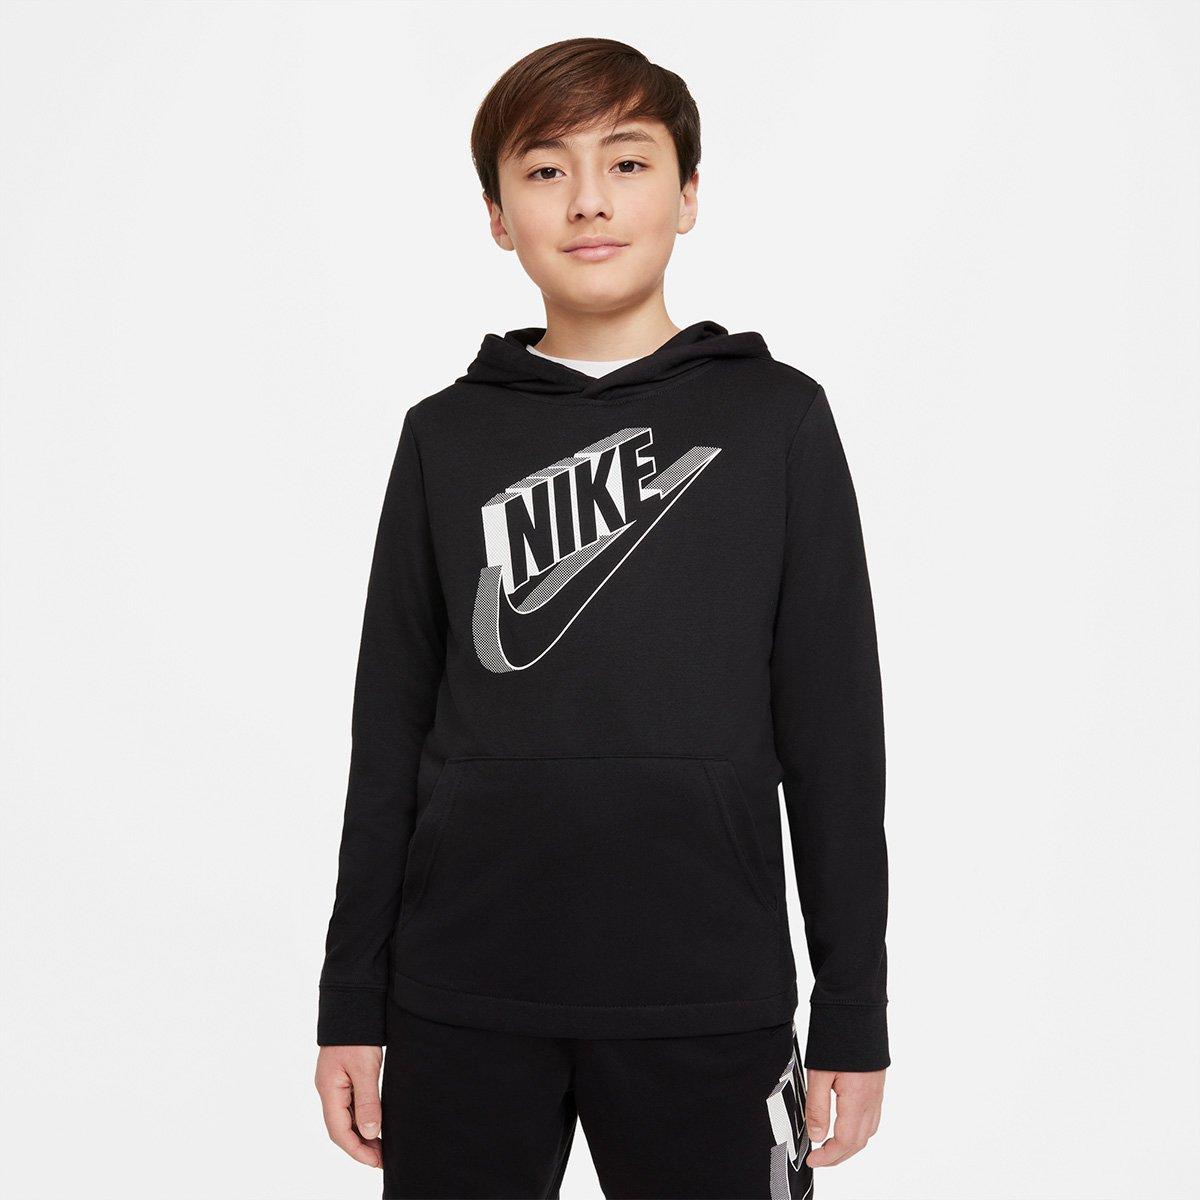 Moletom Infantil Nike Sportswear Capuz Masculino